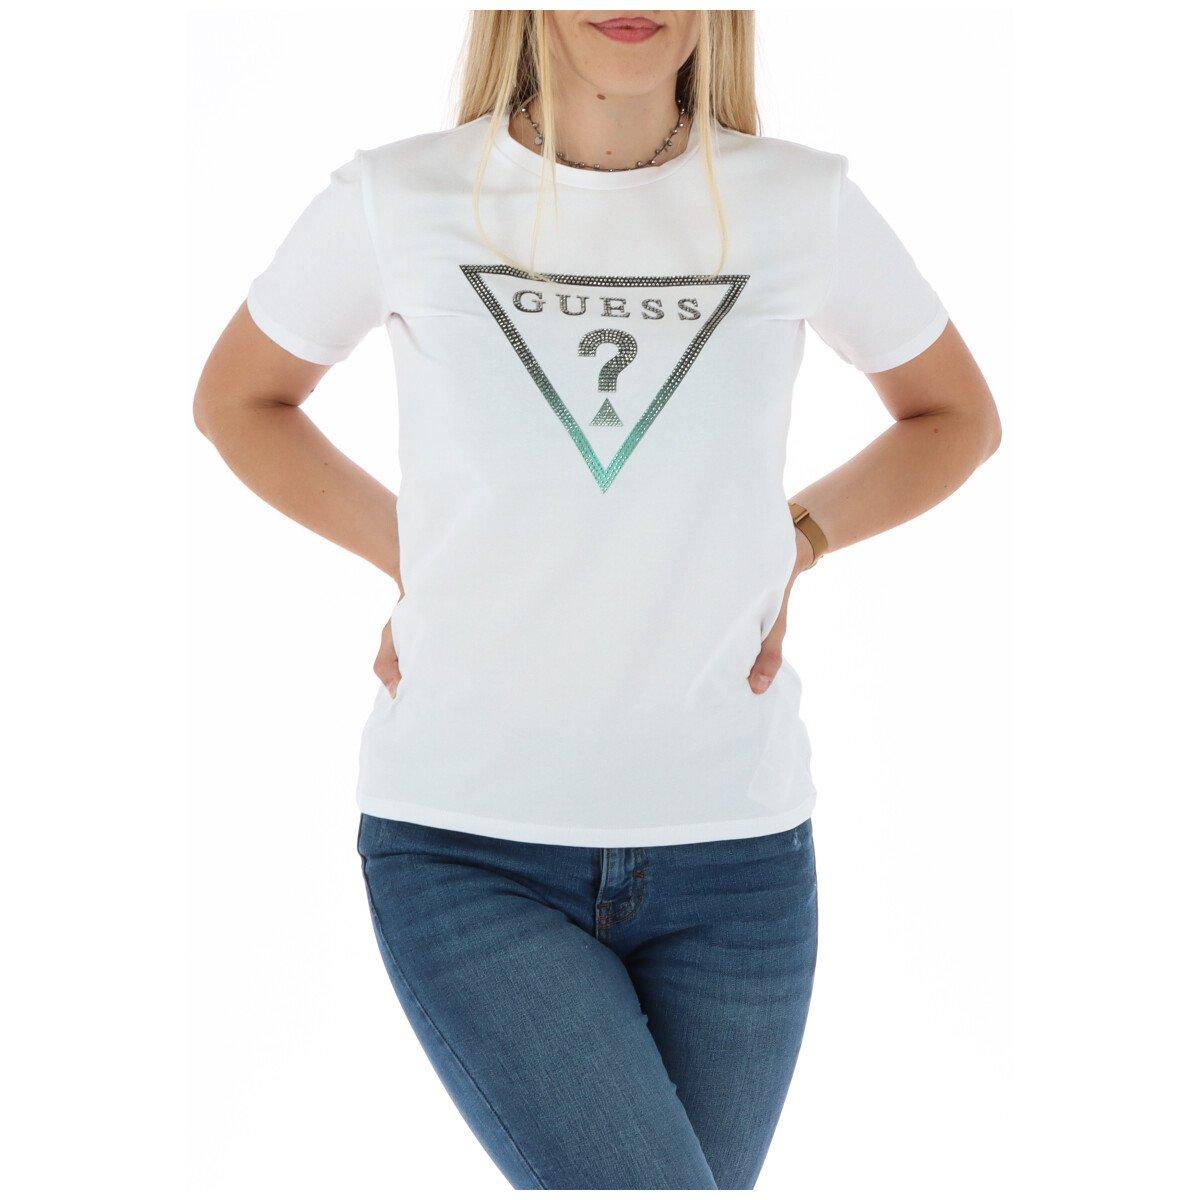 Guess Women's T-Shirt White 301081 - white-1 S